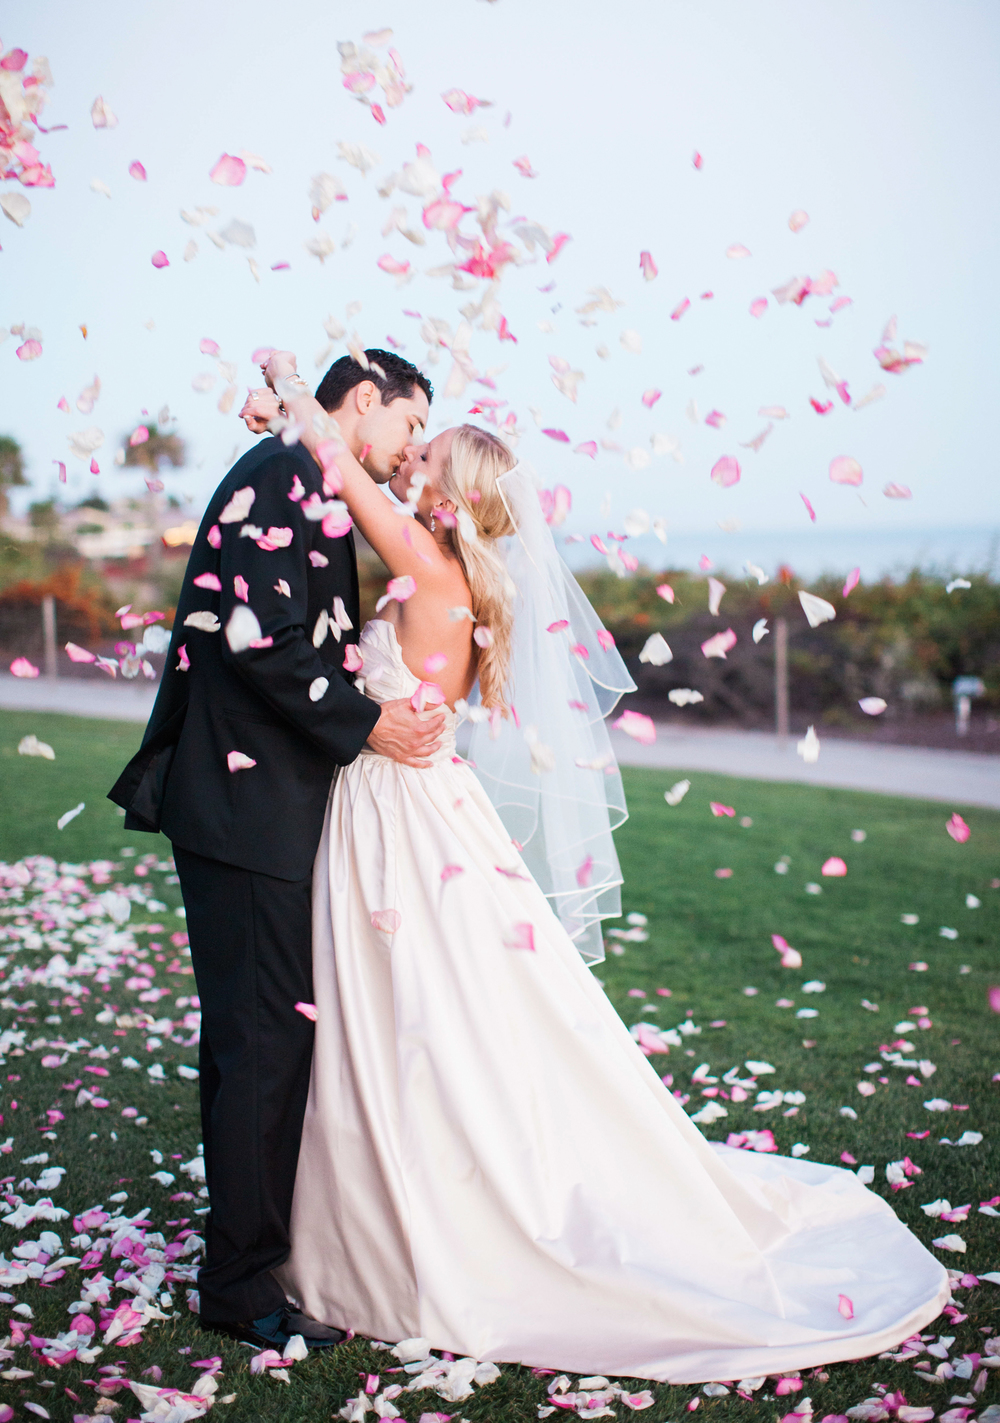 Santa Barbara Wedding Photographer Skyla Walton (7 of 7).jpg